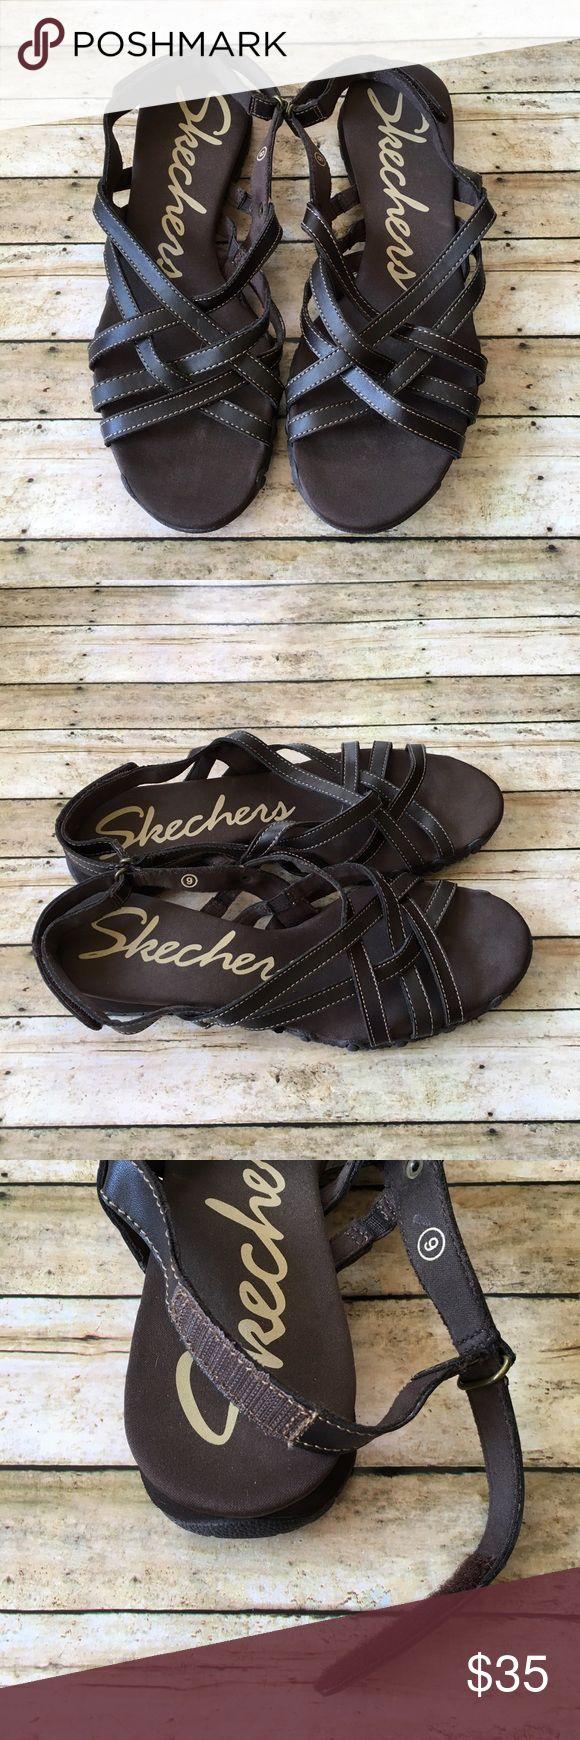 Skechers Bikers 'Dream Weaver' Fisherman Sandals Skechers Bikers 'Dream Weaver' Fisherman Sandals. SZ 9. Dark Brown leather. Adjustable heel strap. Rubber sole. Excellent Used Condition. Skechers Shoes Sandals